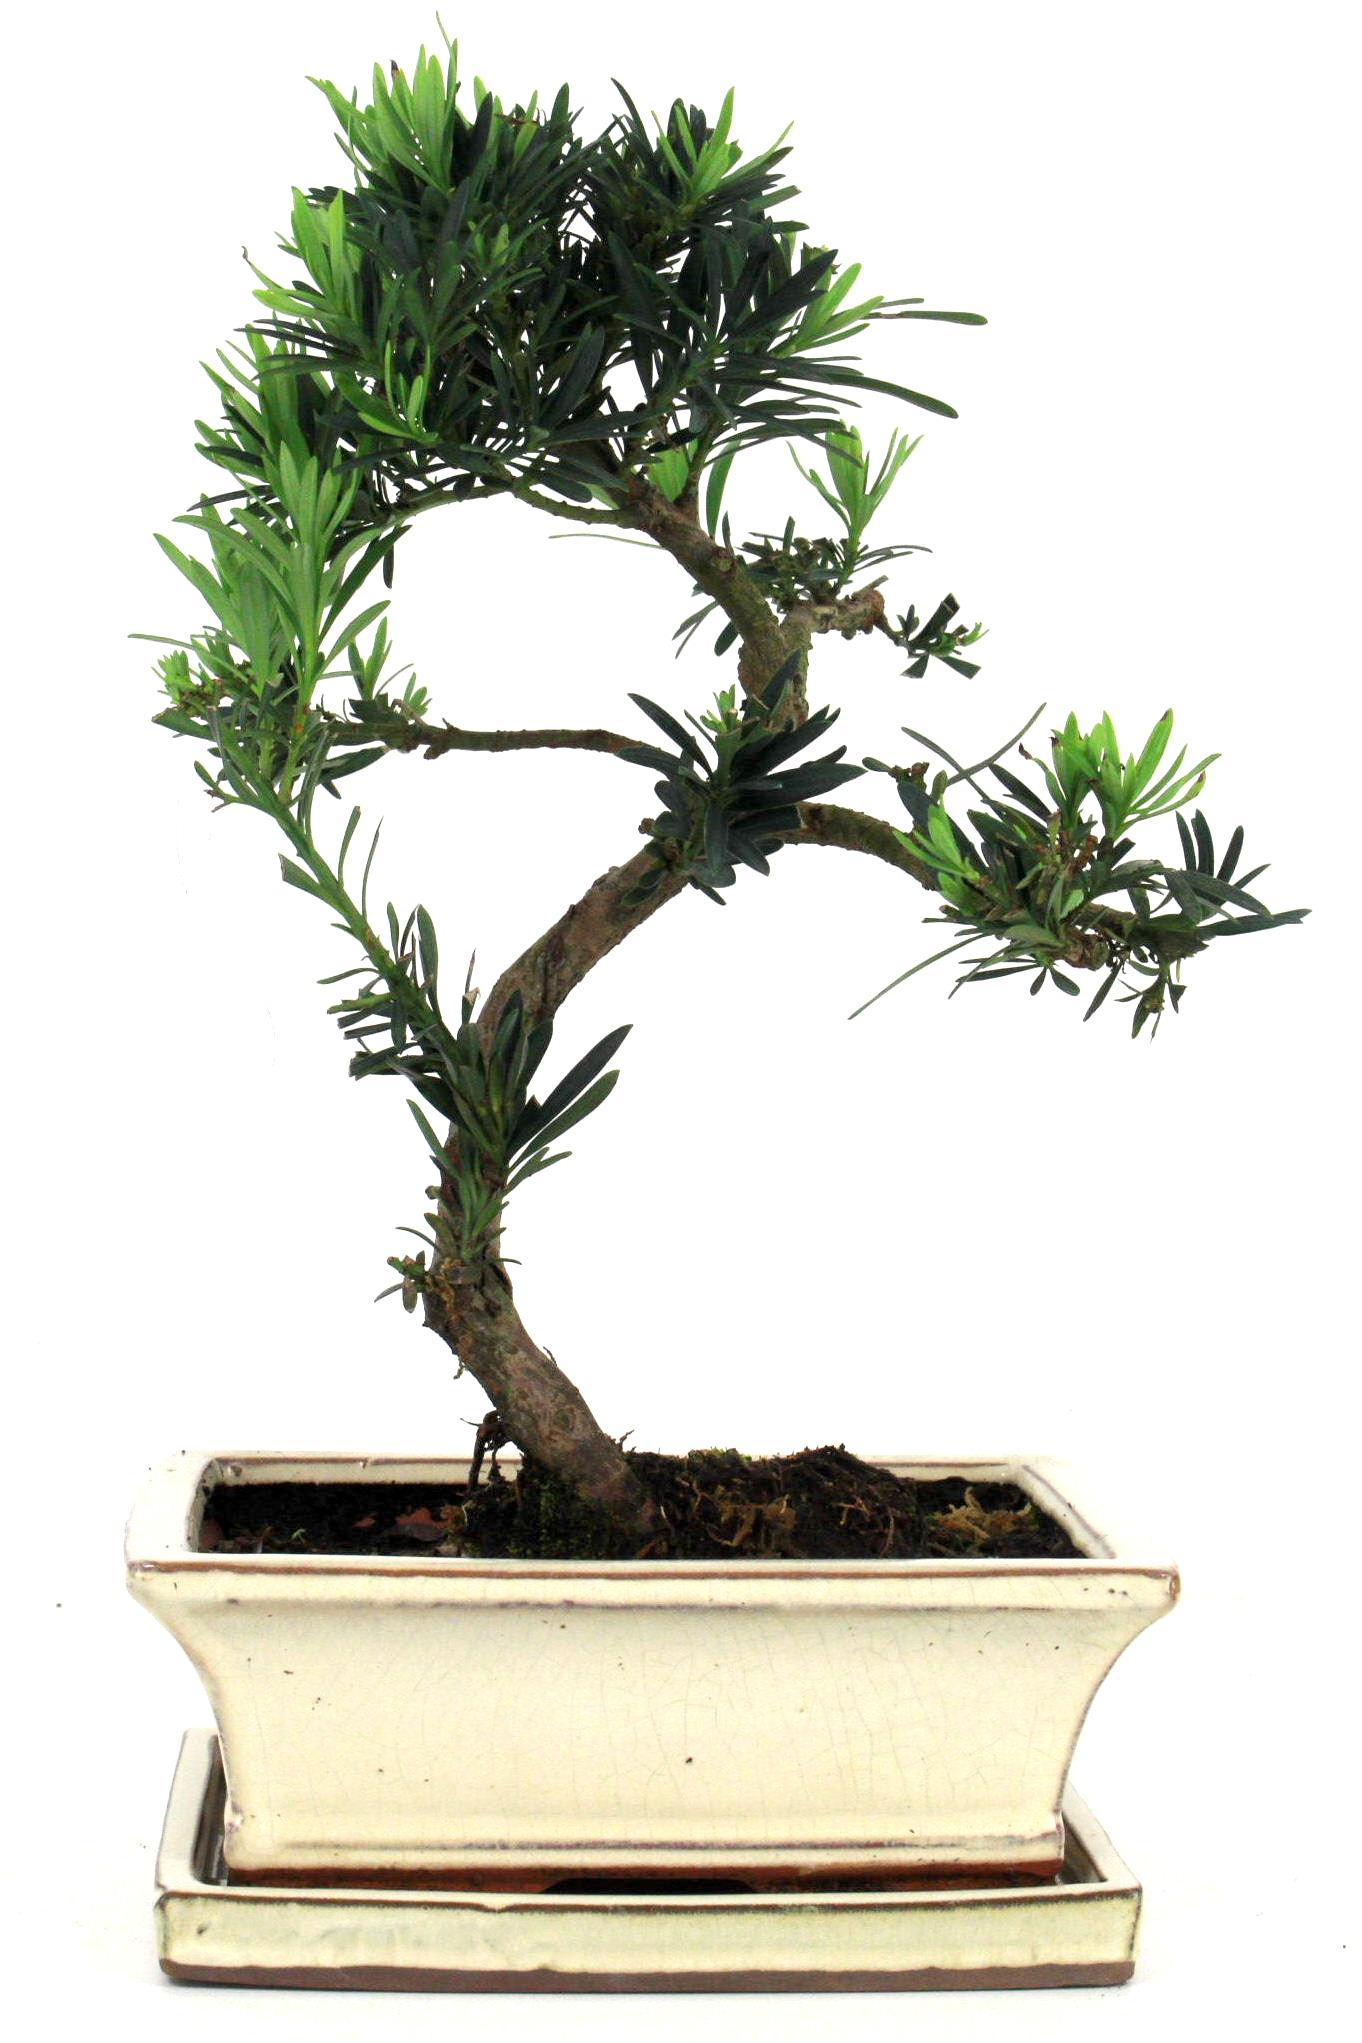 steineibe bonsai 35 40 cm 1938 bei oyaki bonsai kaufen. Black Bedroom Furniture Sets. Home Design Ideas